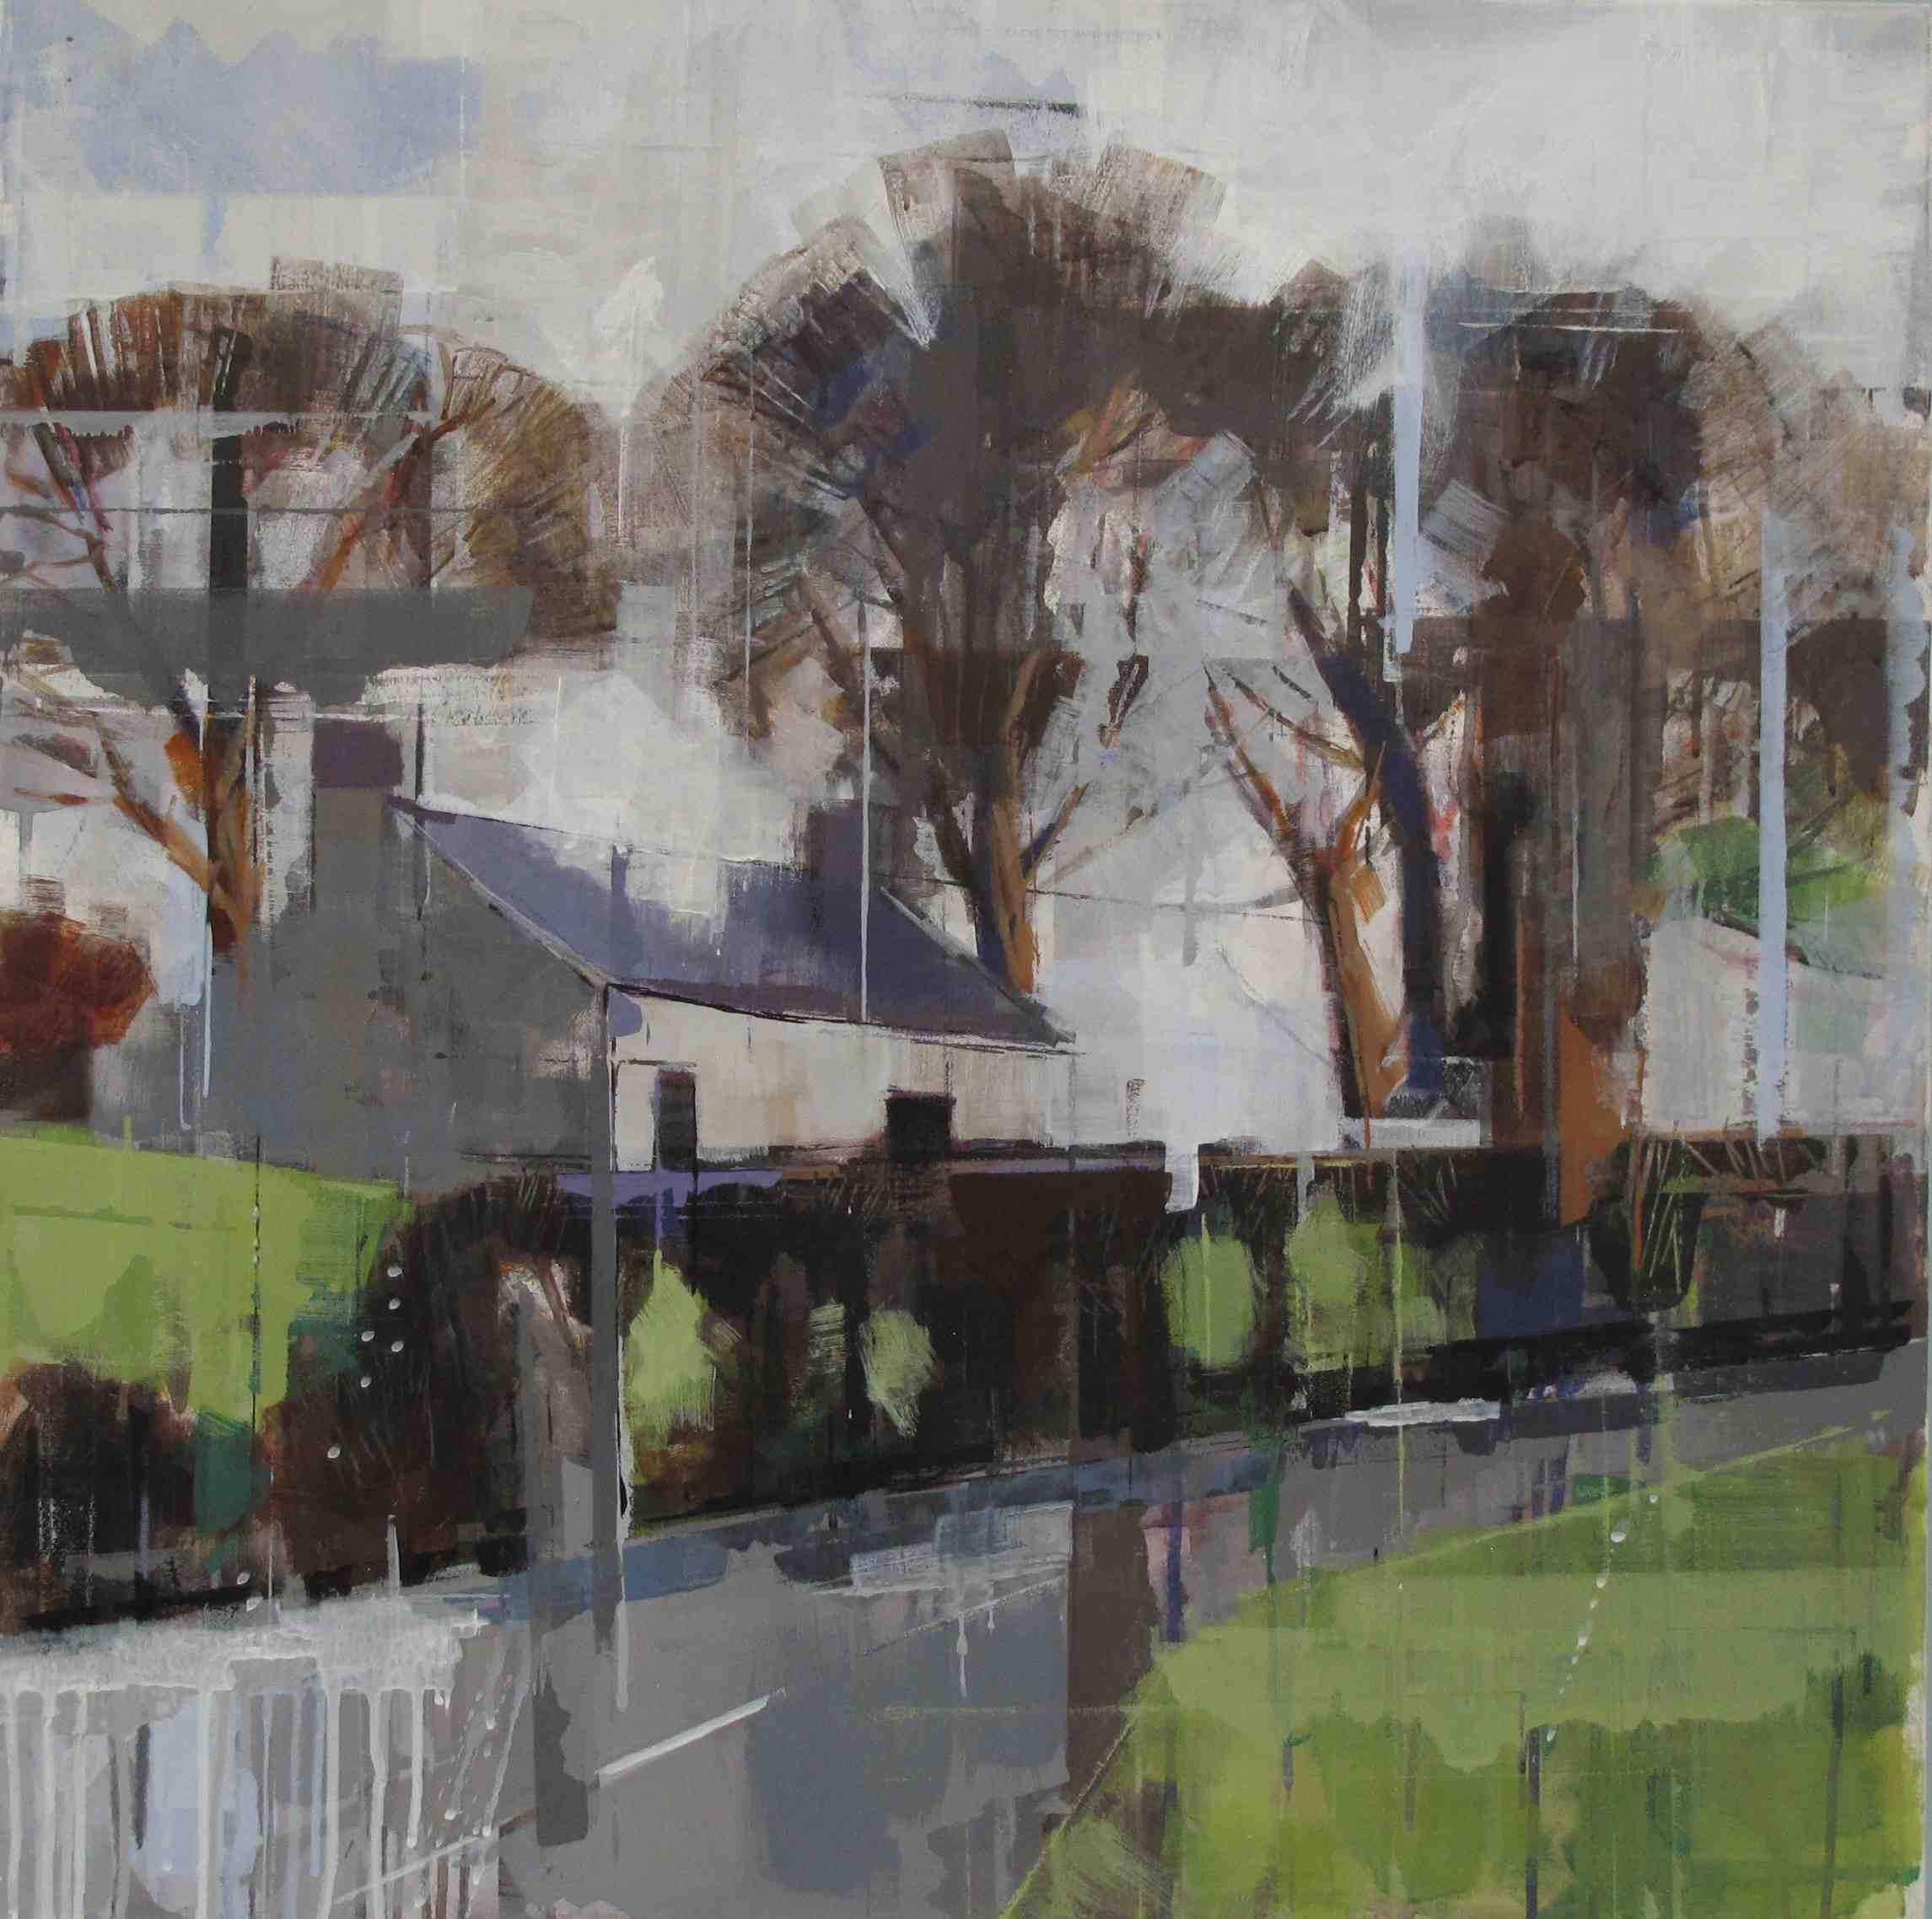 Bridget Flinn, Cottage After Rain, acrylic on paper, 70 x 70 cm